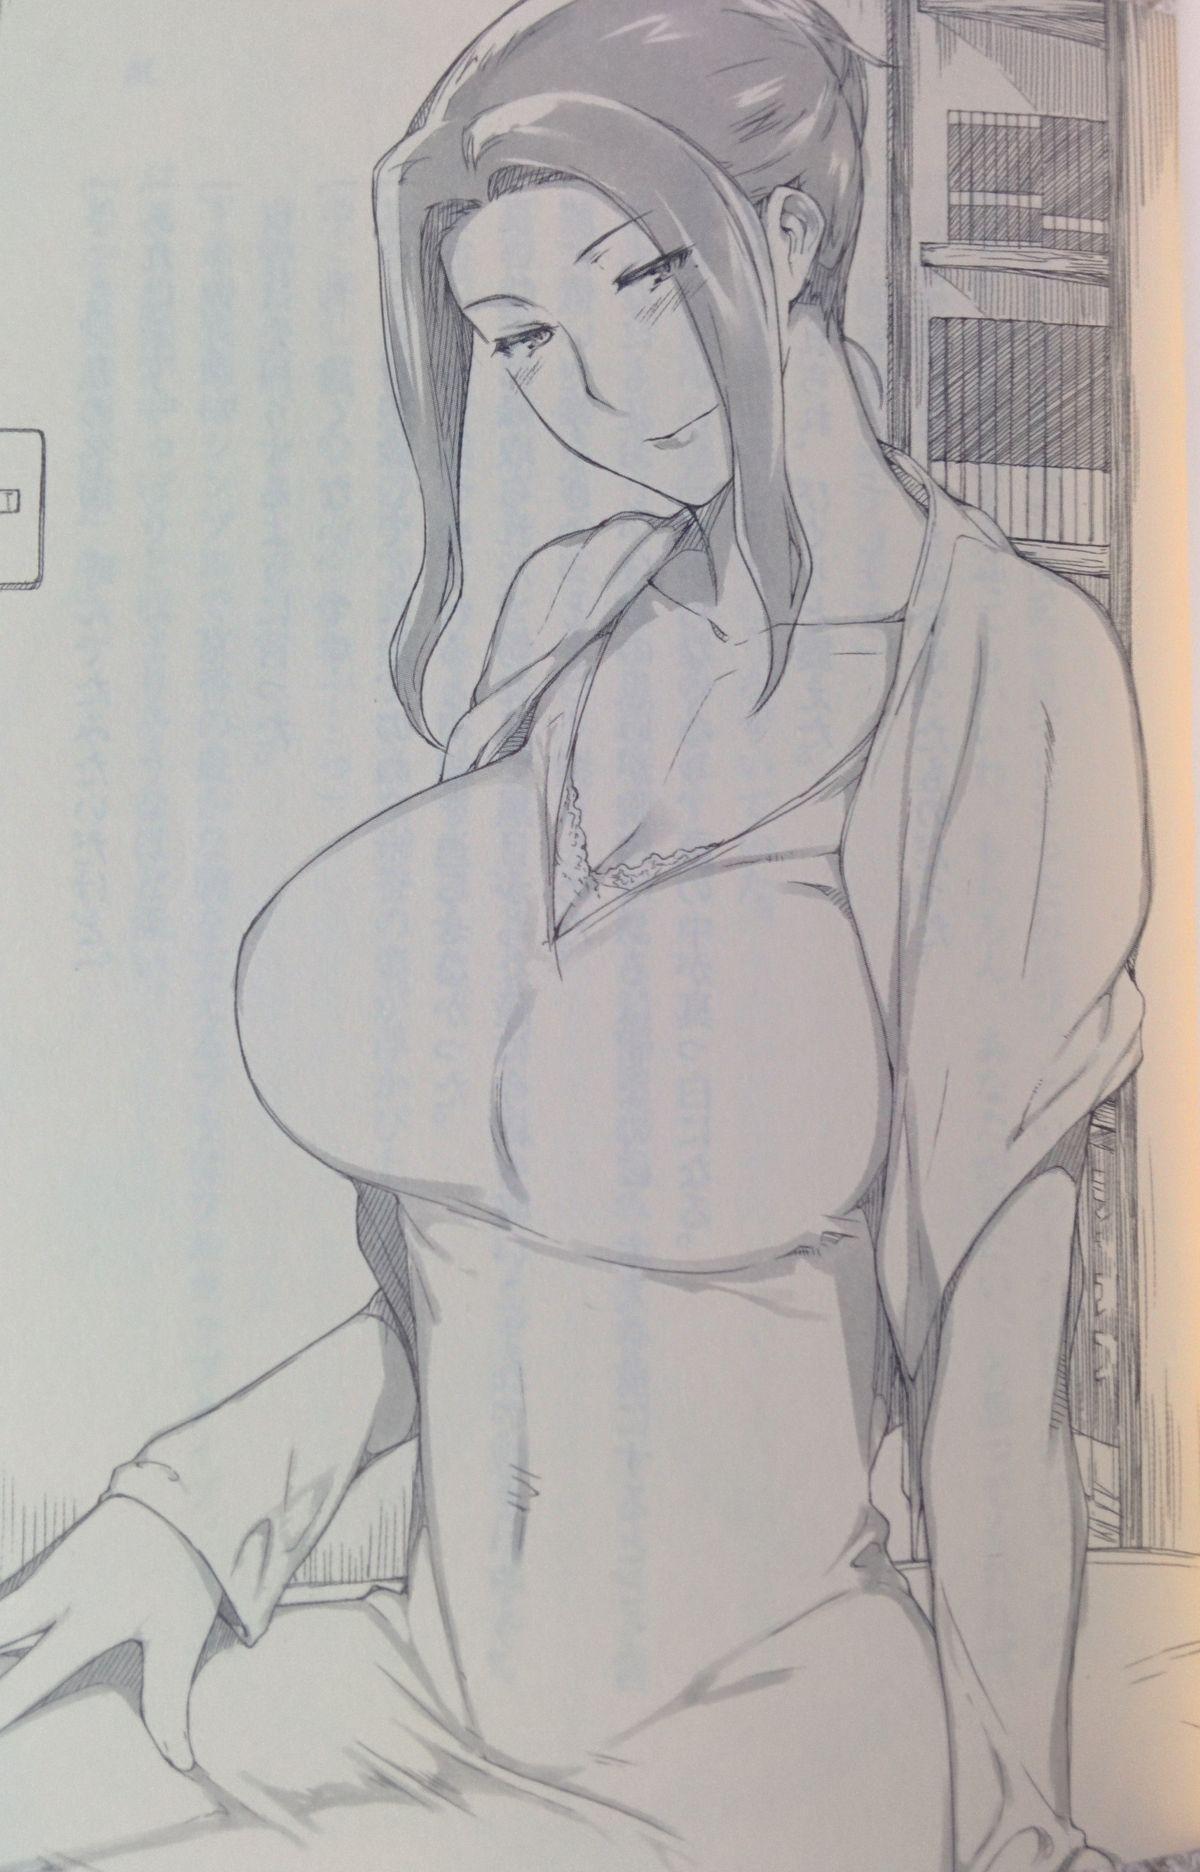 MTSP Tachibana Household's affairs with men 6